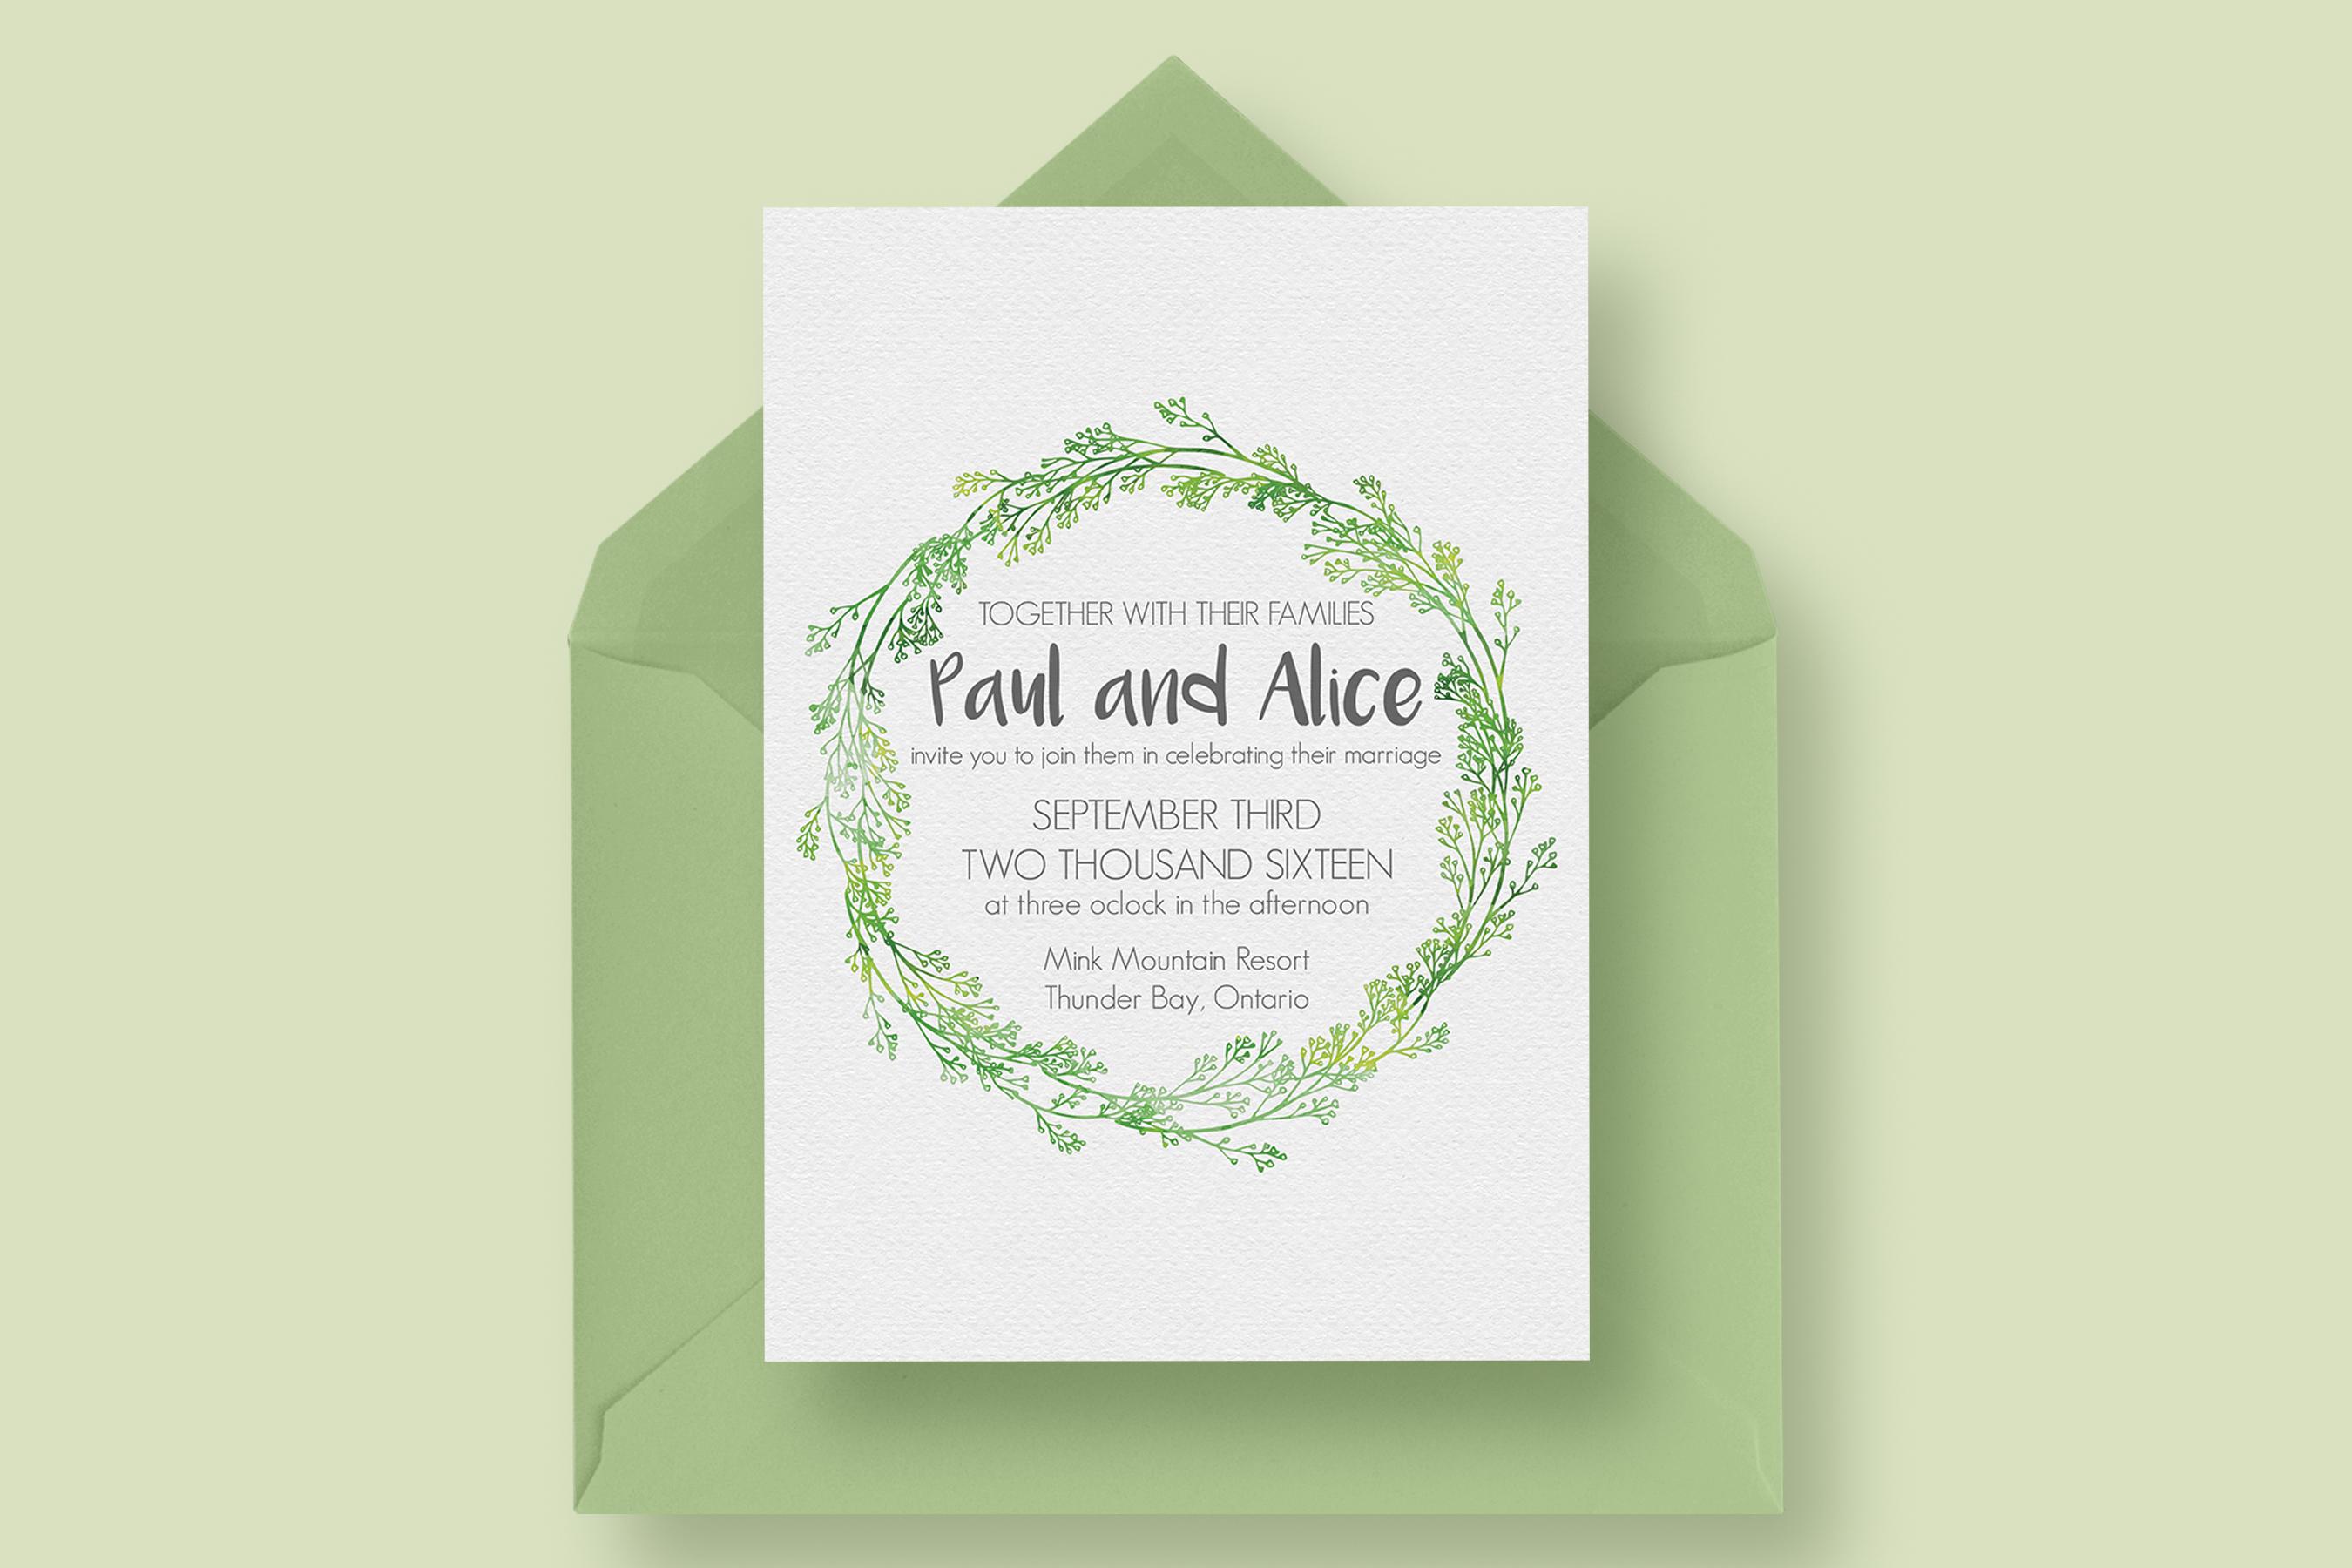 hip wedding invitation suite invitation templates on With hip wedding invitations template